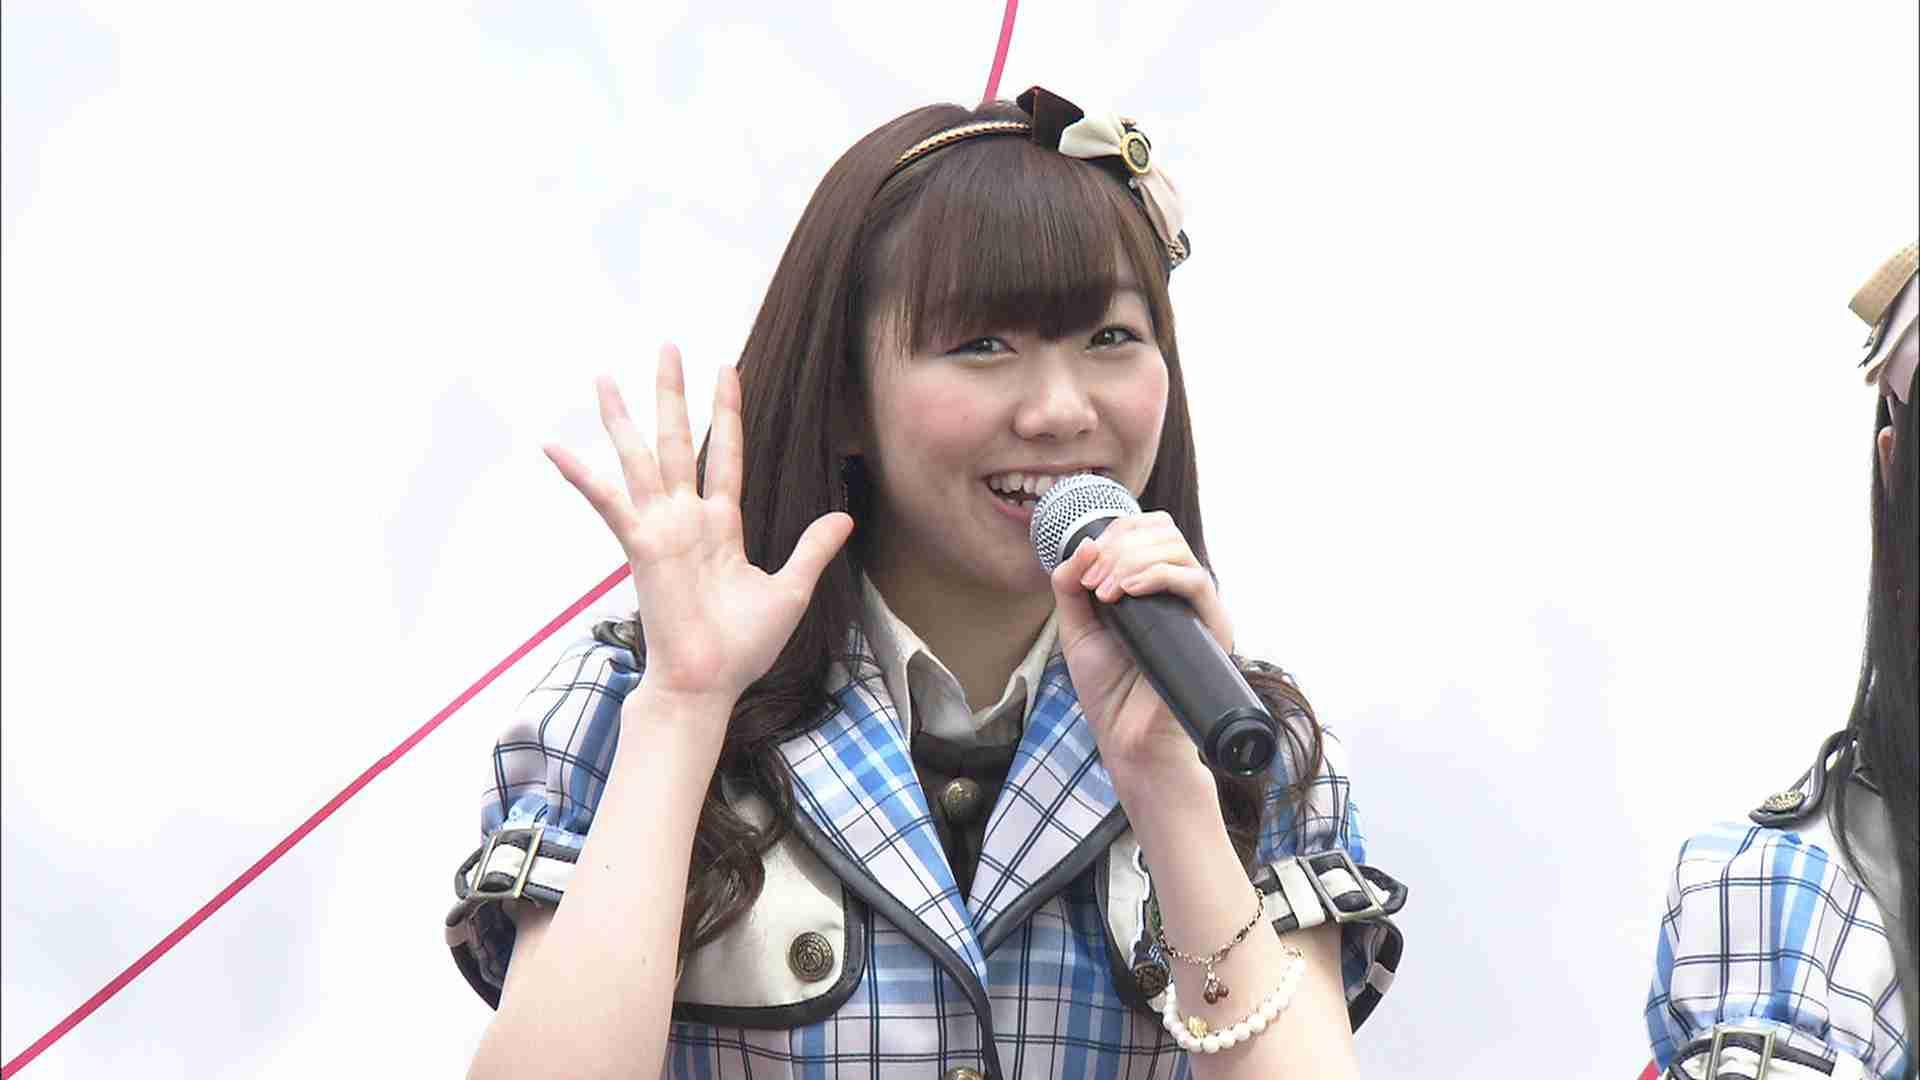 SKE48須田亜香里さん殺害をツイッターで示唆 ファンの男逮捕 「好き過ぎて…」と供述 (東海テレビ) - Yahoo!ニュース